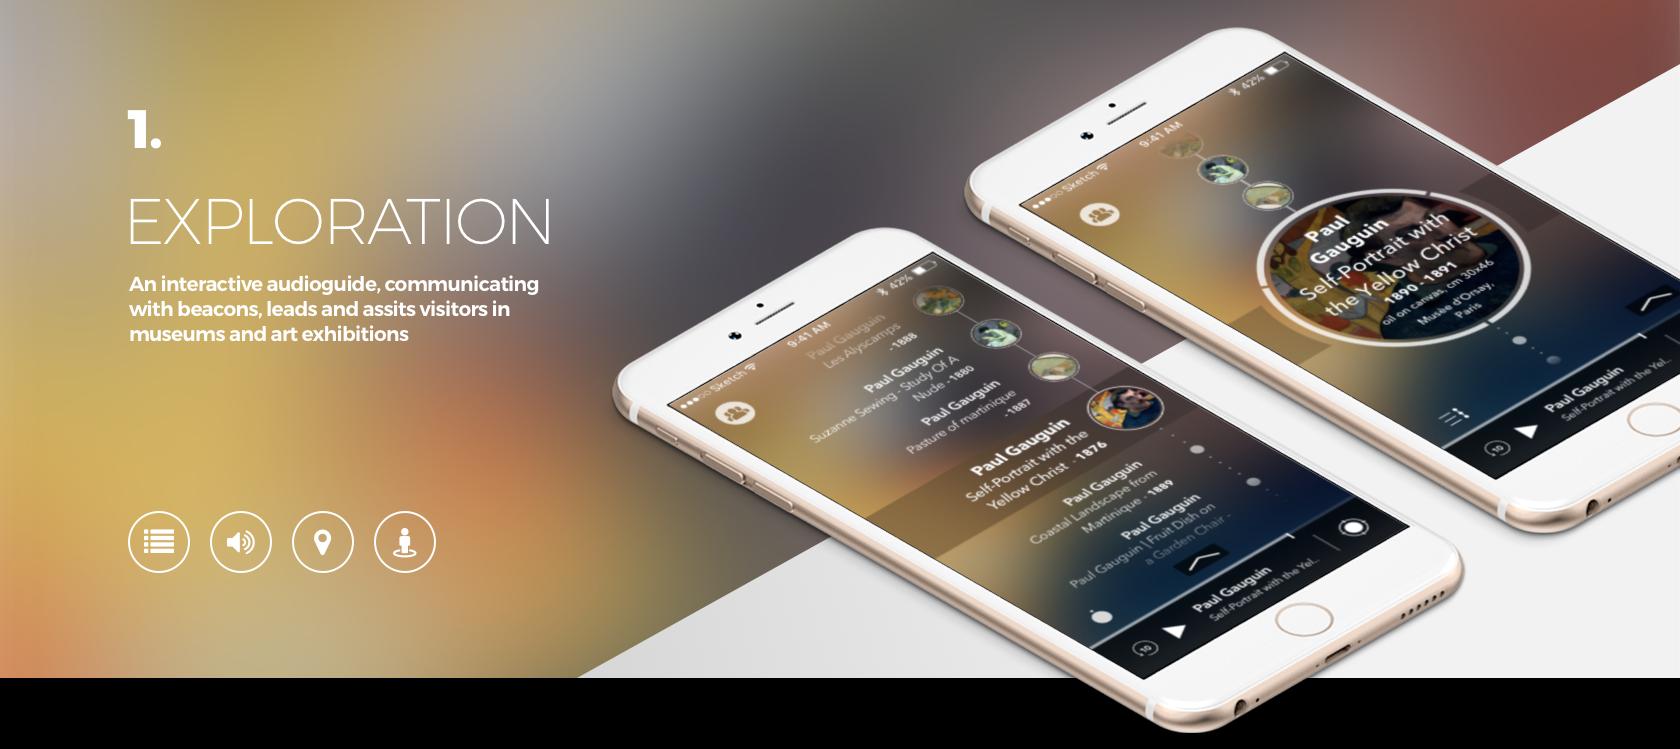 Enjoymuseum. Museum experience design - Fabio Besti - App concept 1